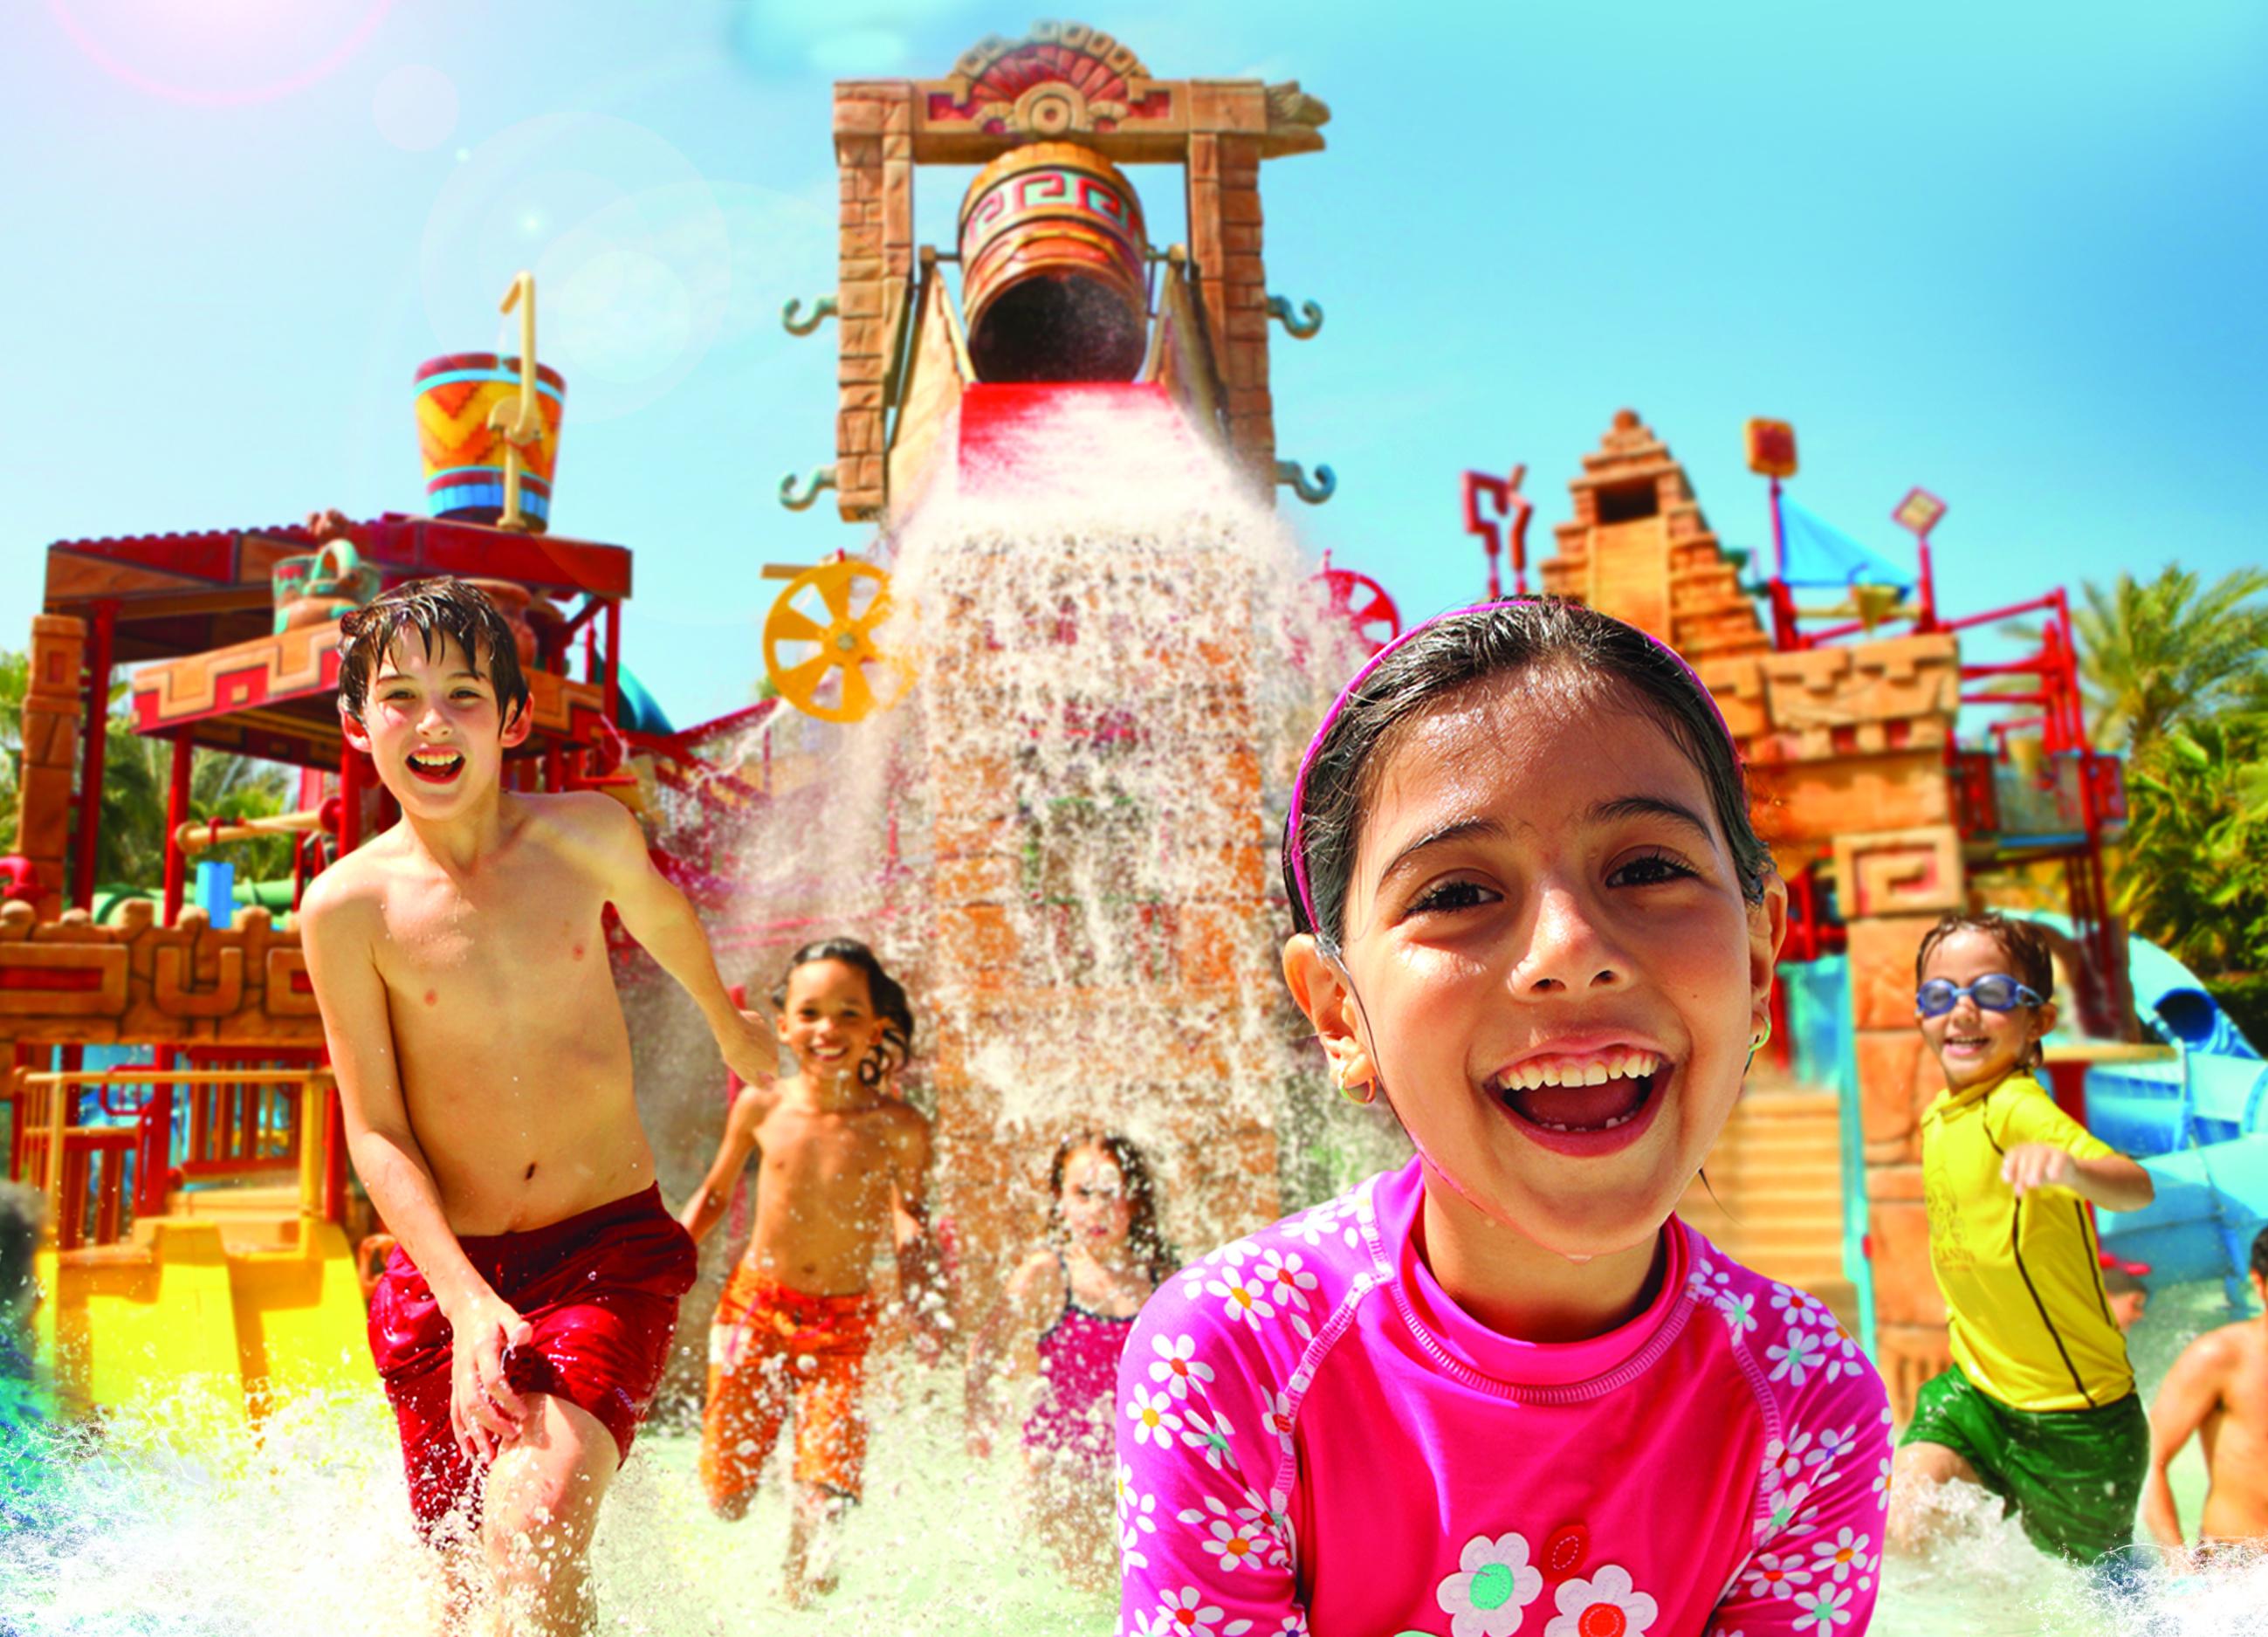 Atlantis Aquaventure Waterpark + The Lost Chambers Aquarium Ticket